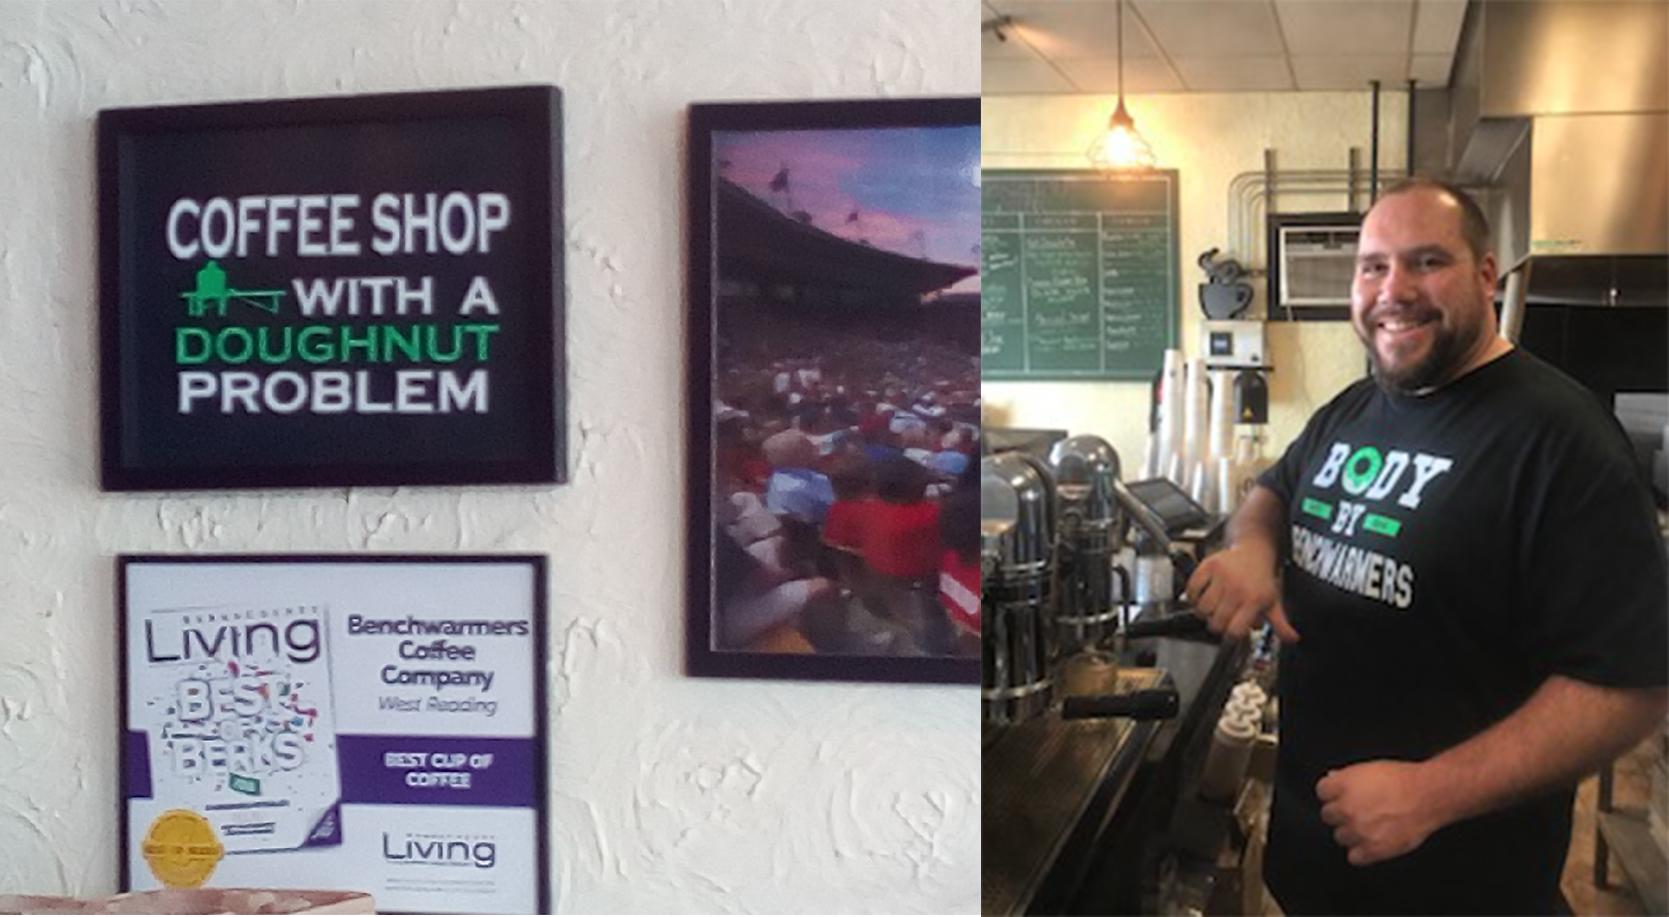 Benchwarmer's Coffee and Doughtnuts owner, Adam Kenderdine